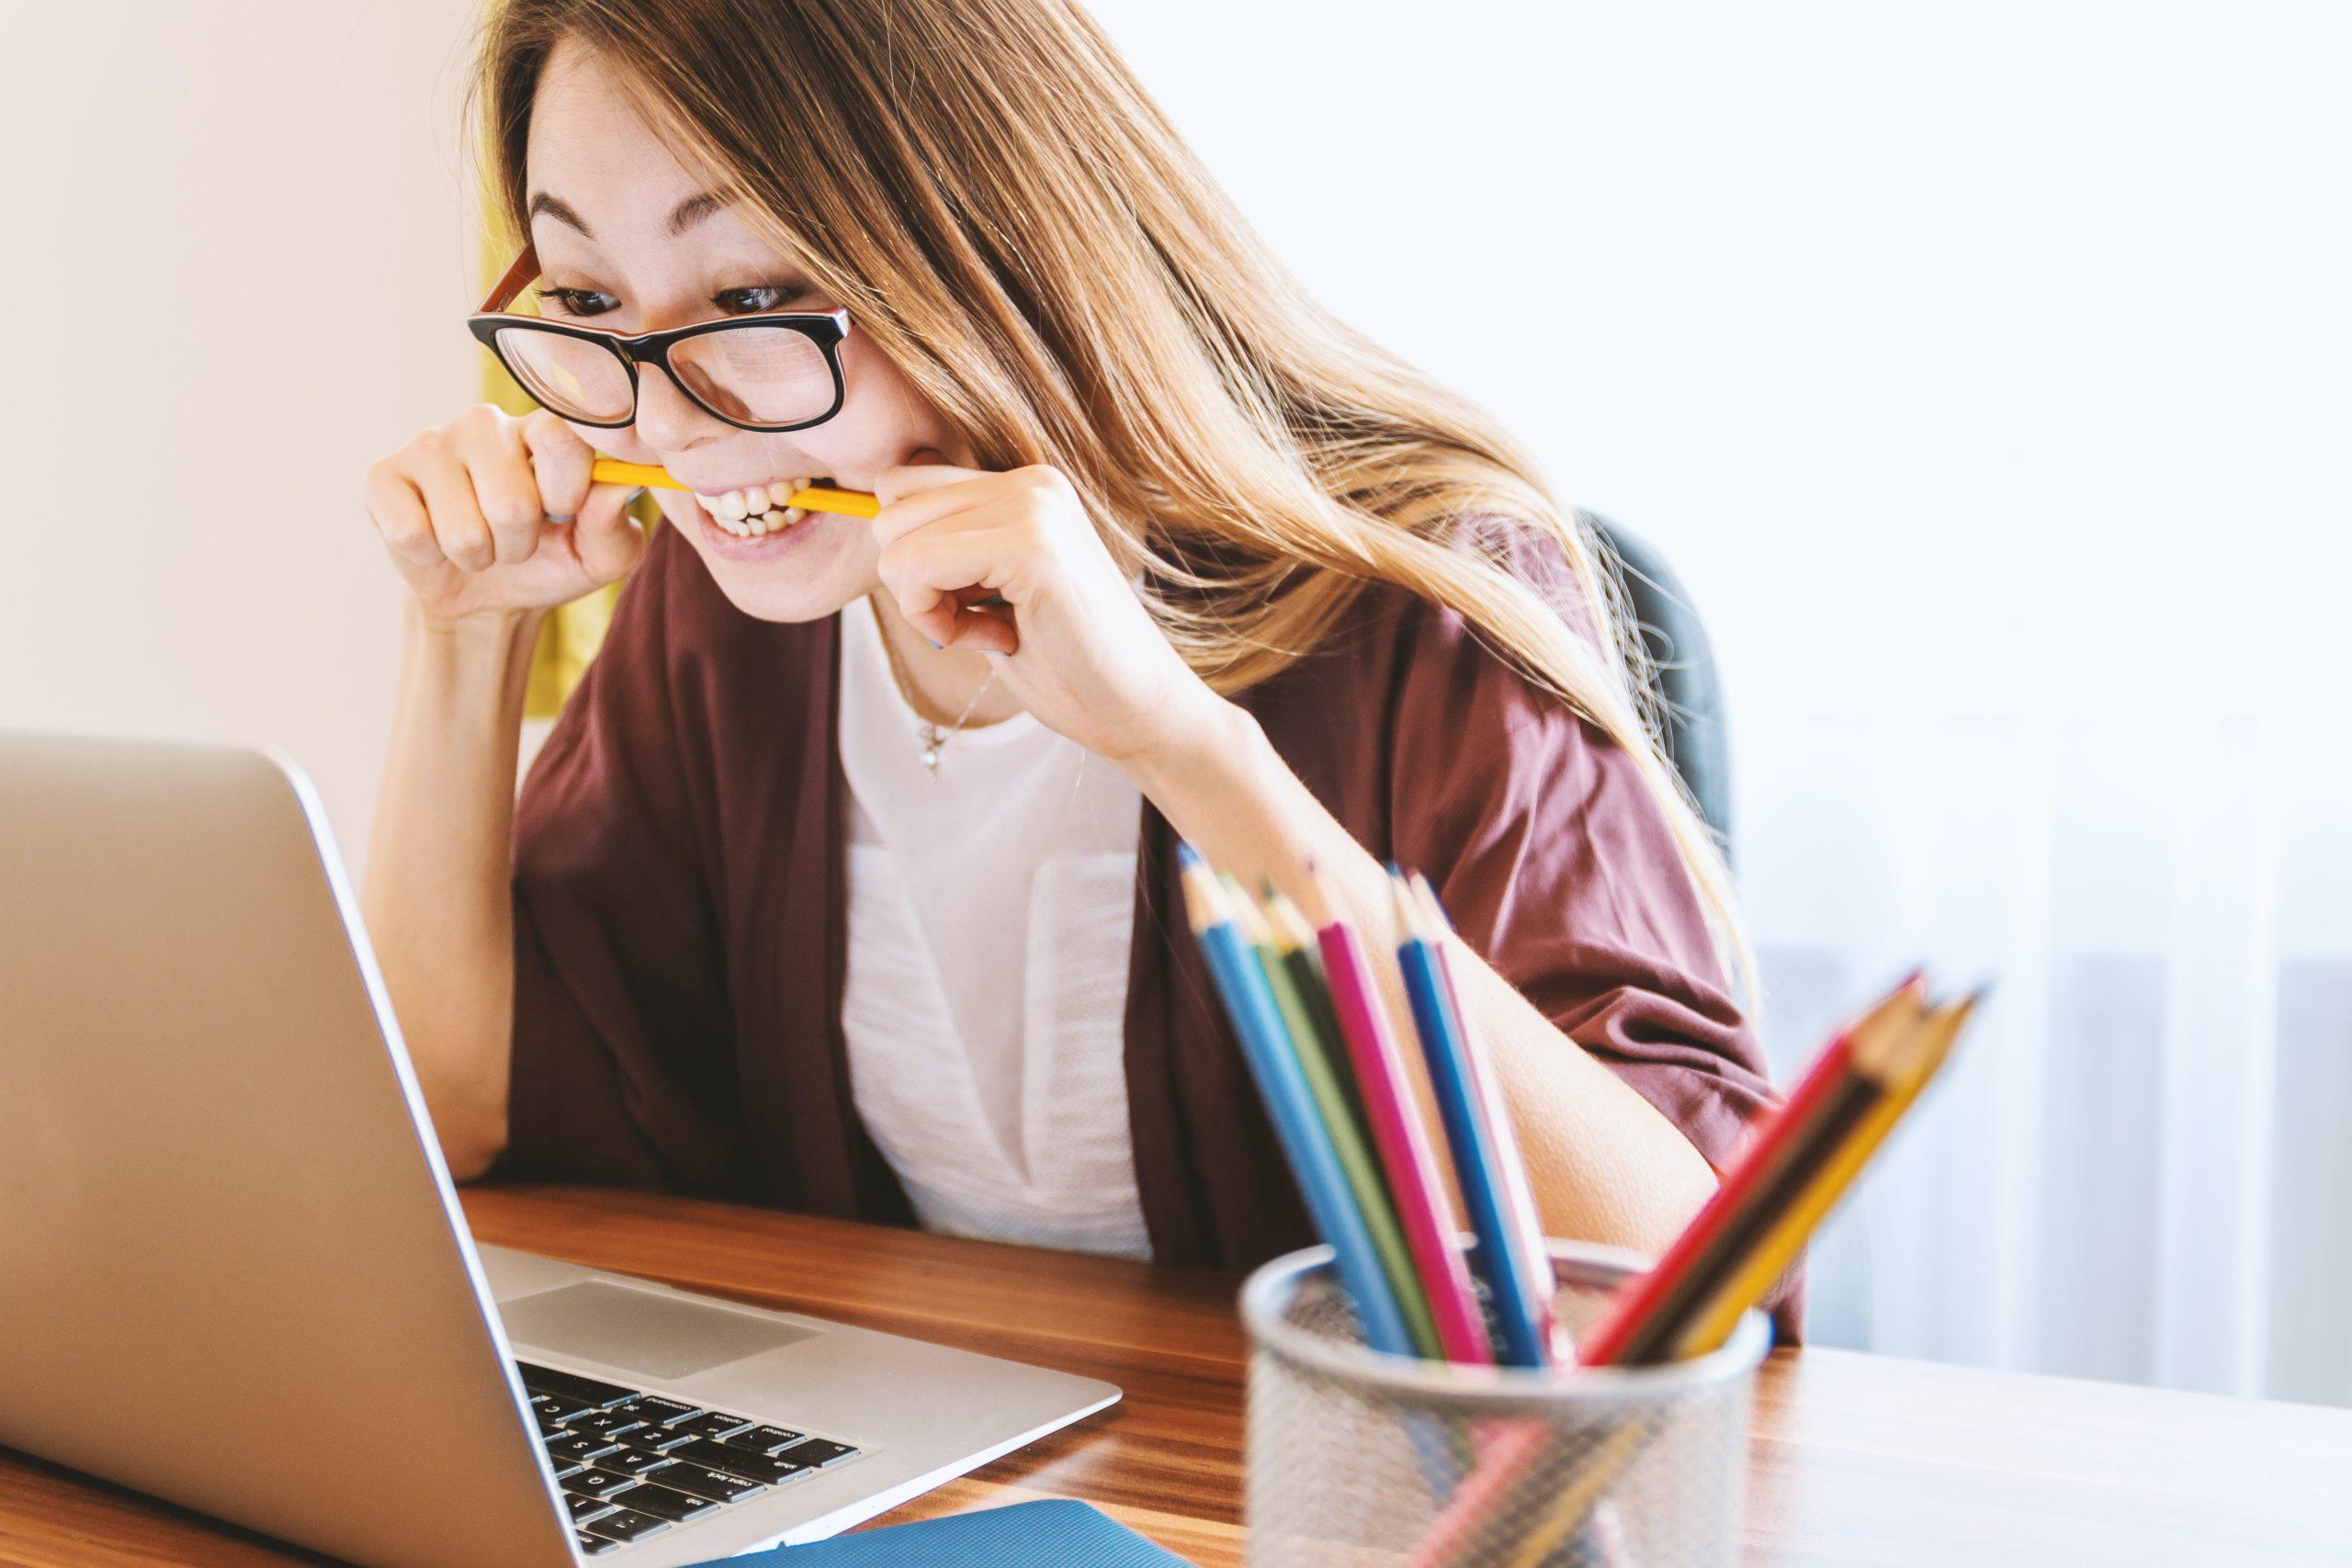 stress prépa examen sophrologie et reiki lucie louâpre